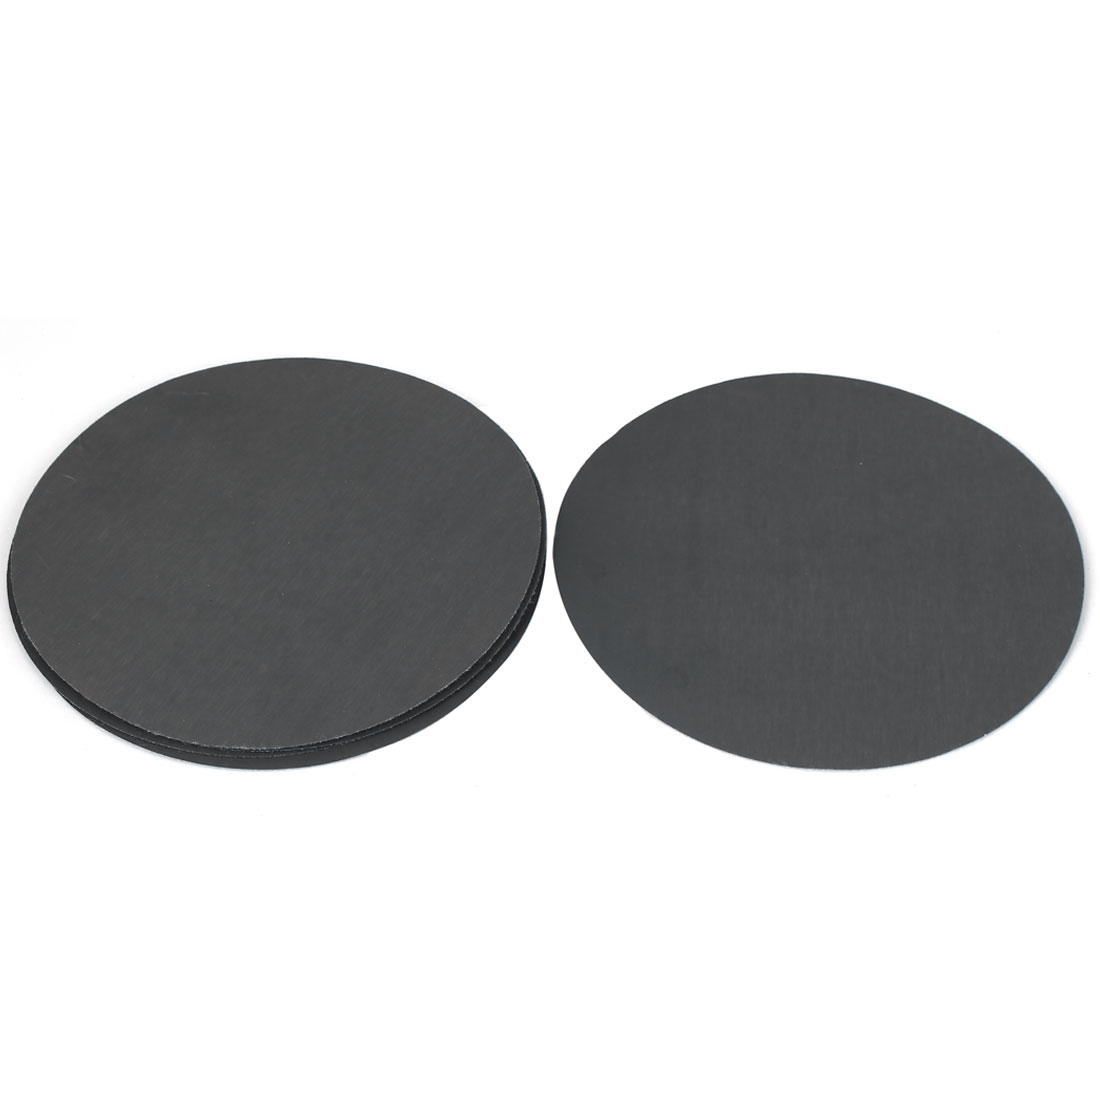 15cm Dia 3000 Grit Abrasives Grinding Hook and Loop Sanding Paper Disc 5 Pcs